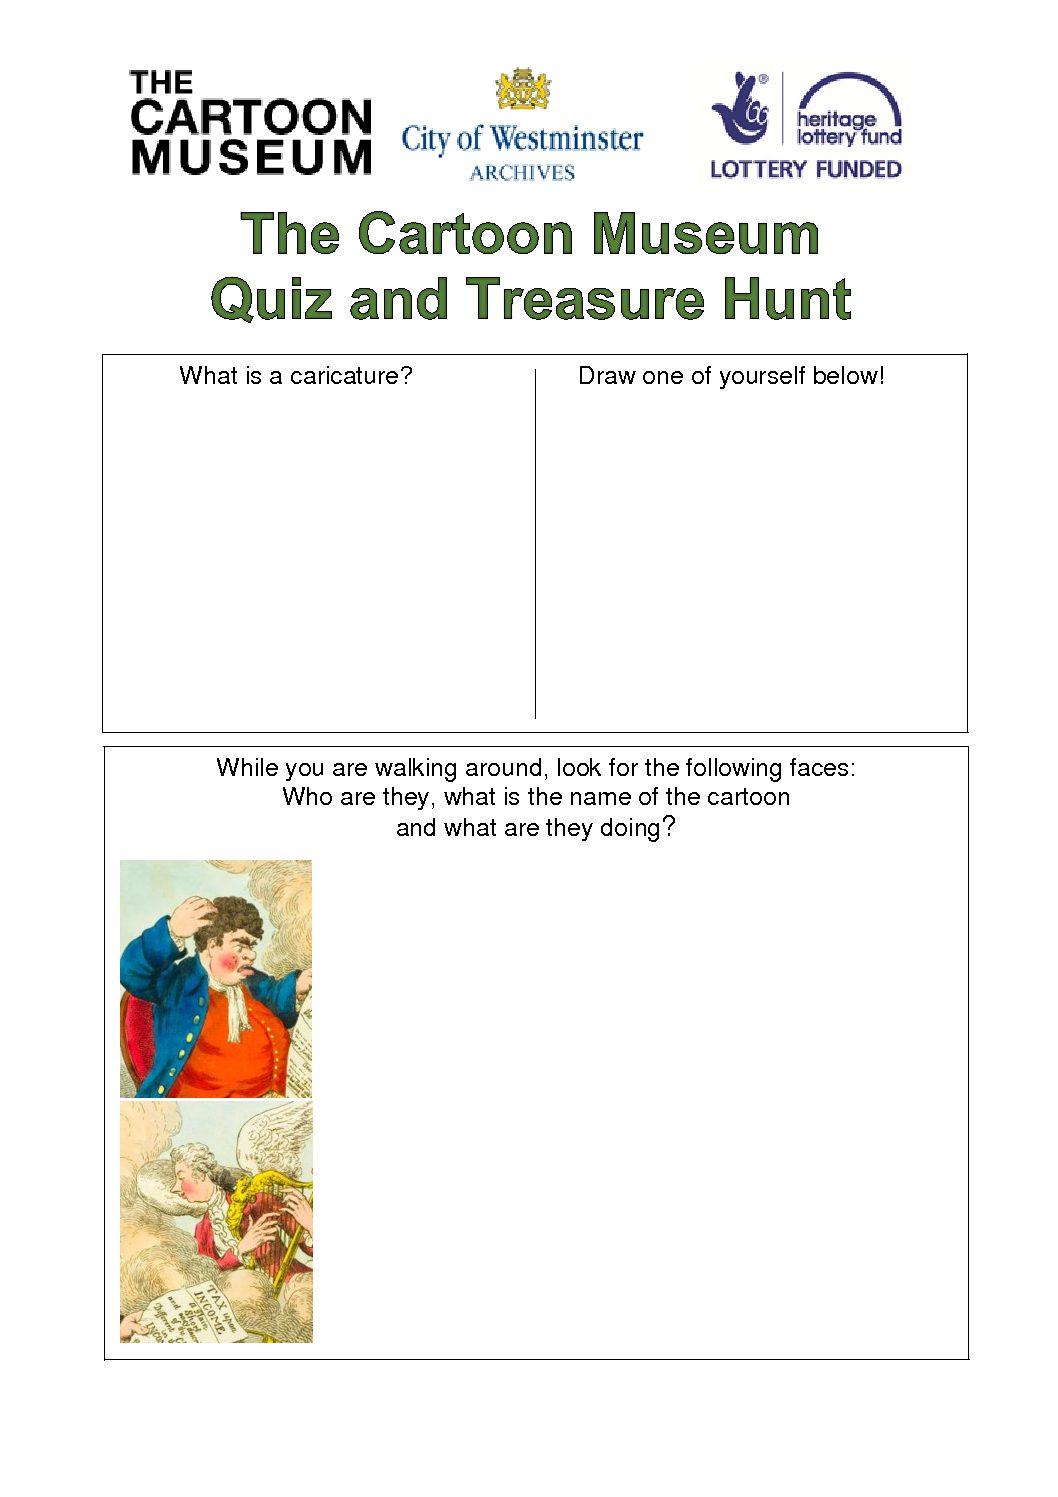 The Cartoon Museum Quiz and Treasure Hunt